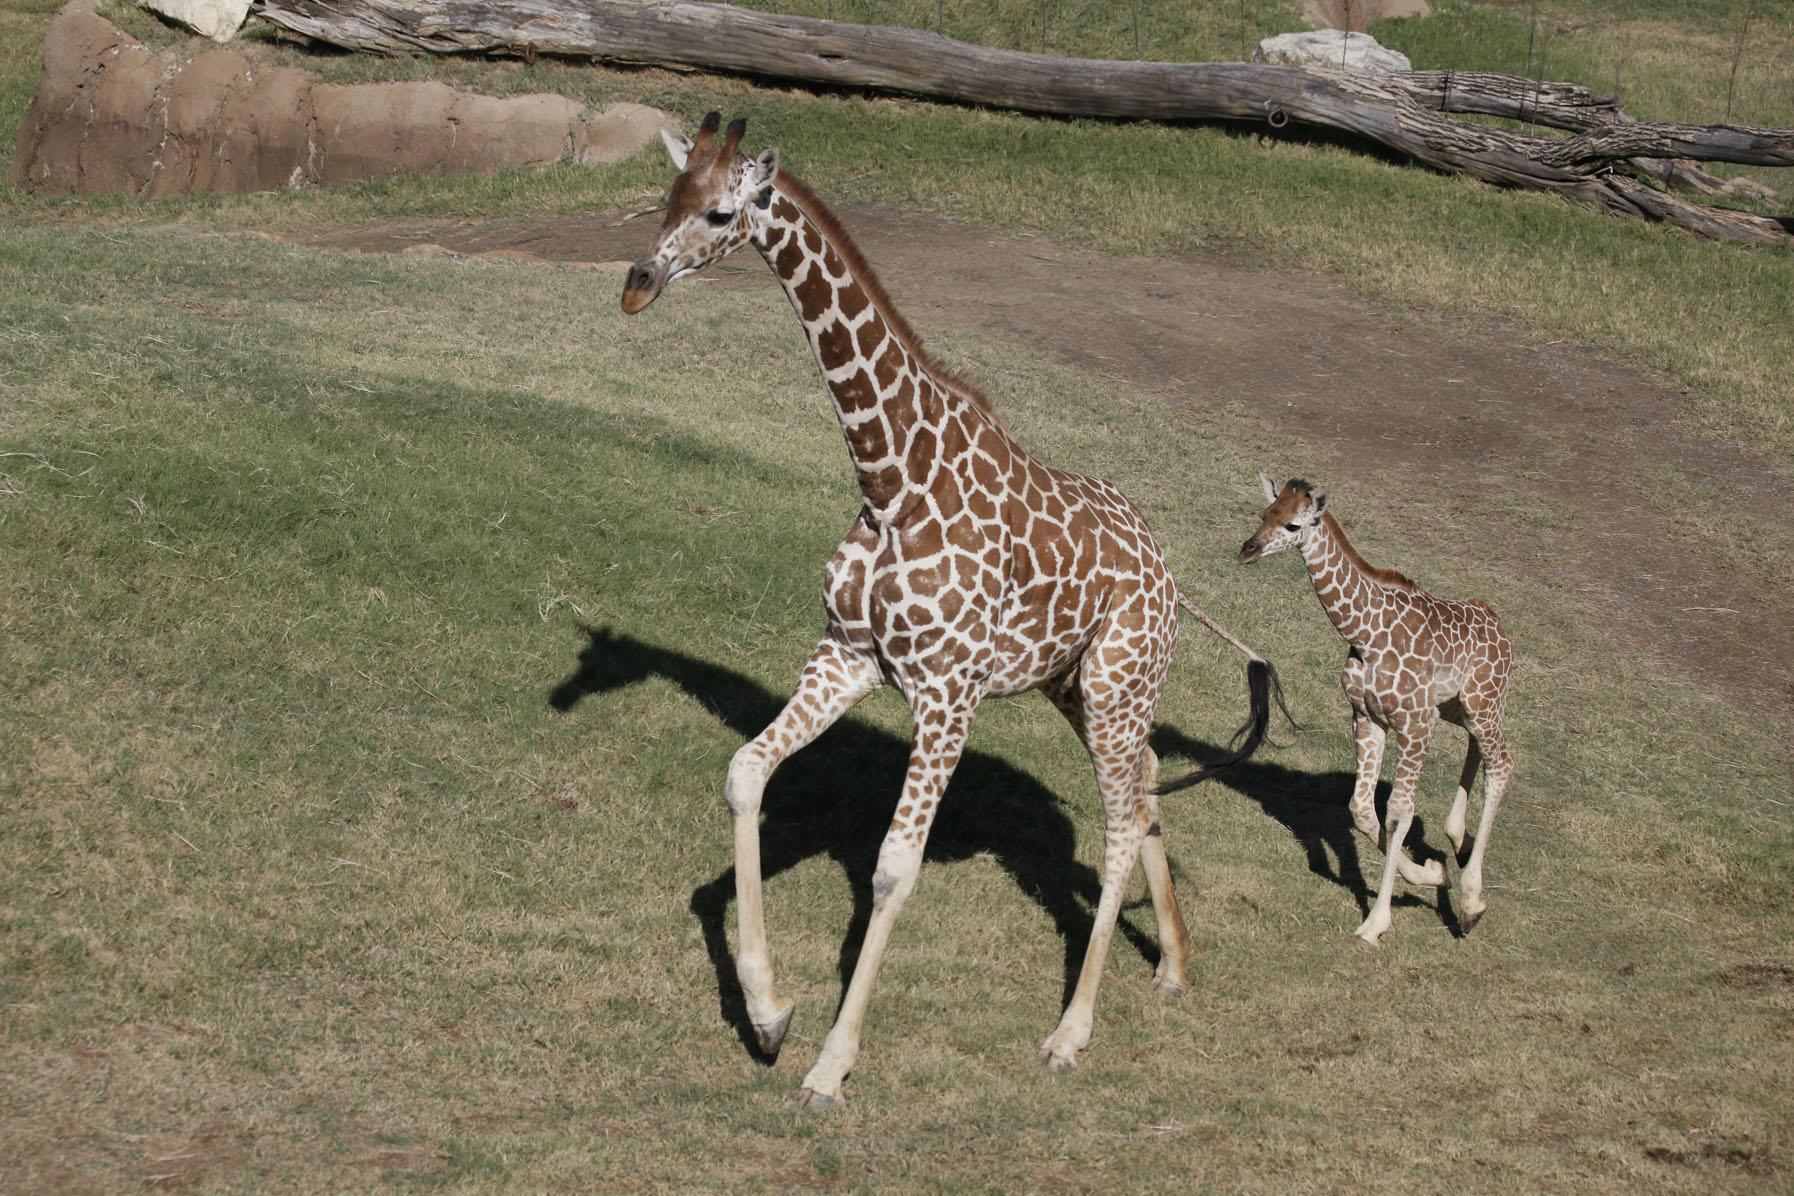 giraffe photos giraffe birth live animal planet